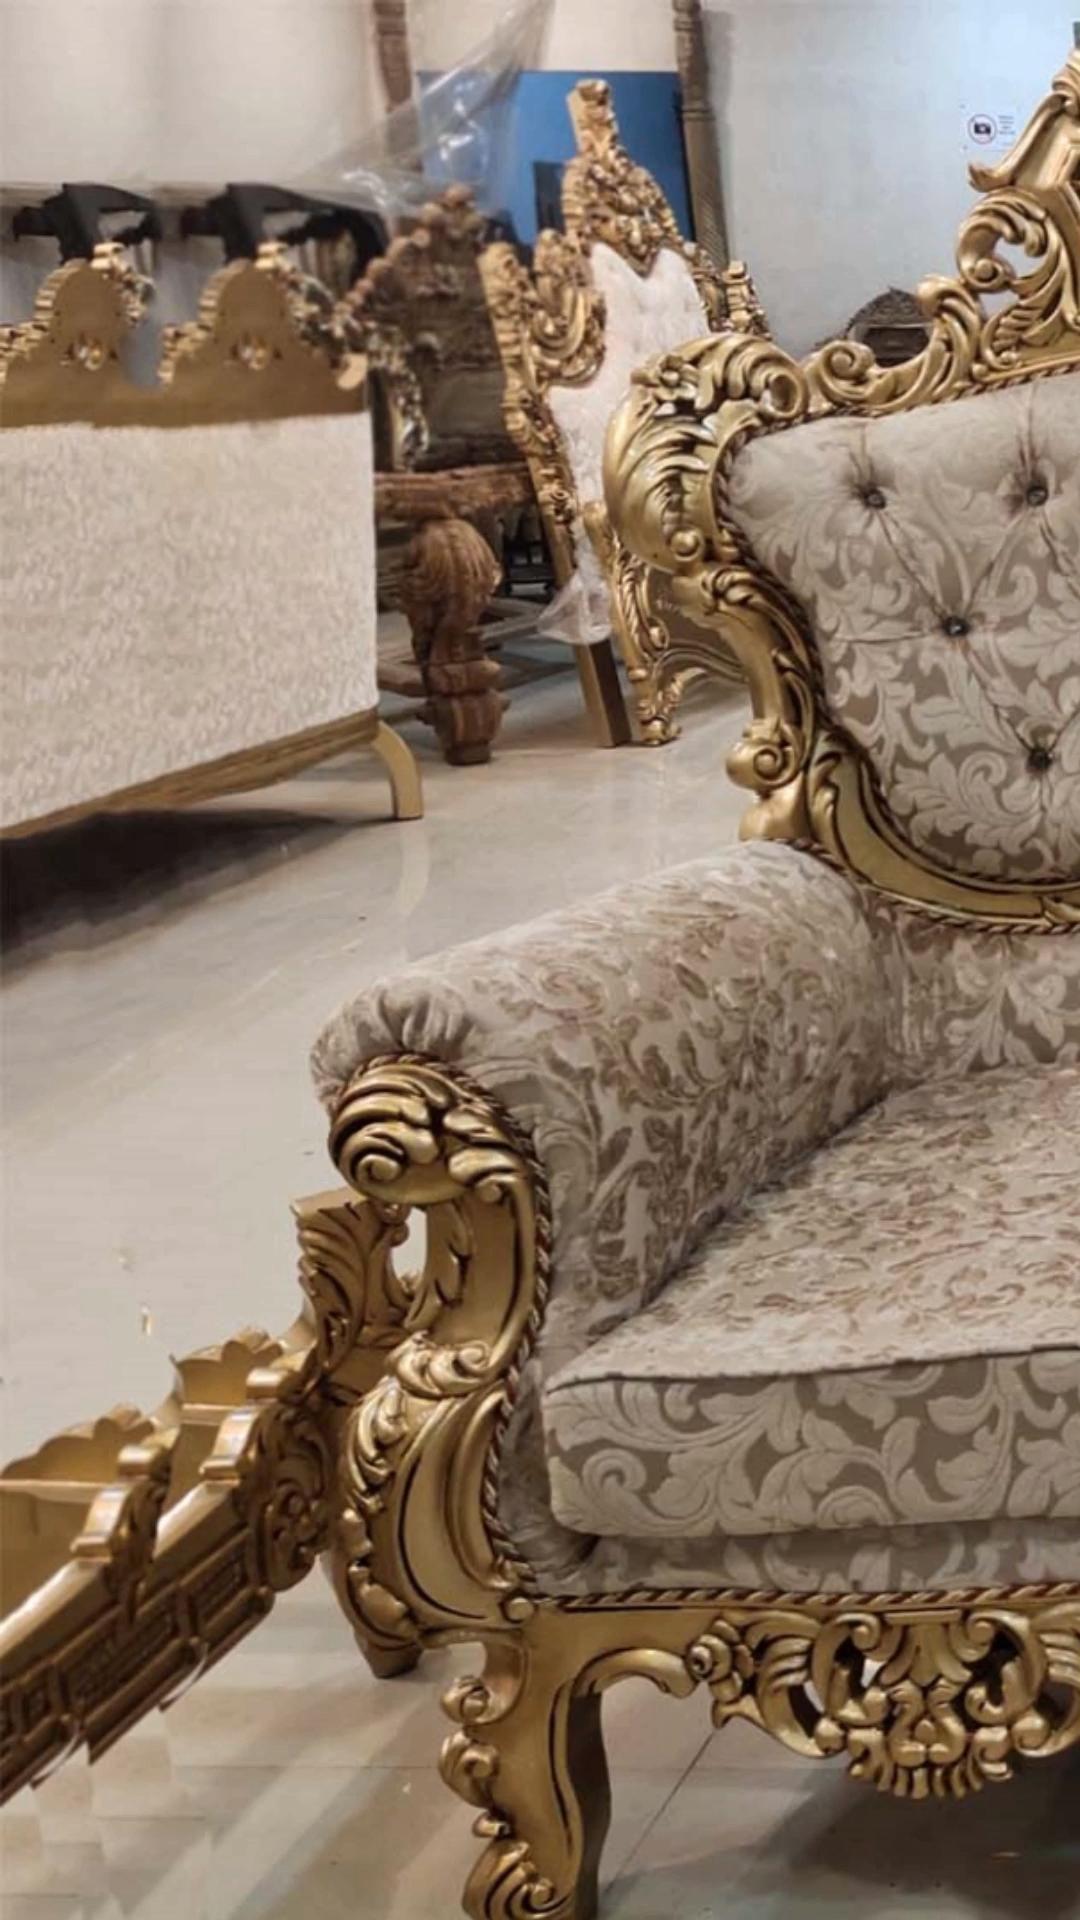 Antique Gold Maharaja Style Sofa Set Aarsun Aarsun Antique Gold Maharaja Set Sofa Style In 2020 Wooden Sofa Set Sofa Set Furniture Design